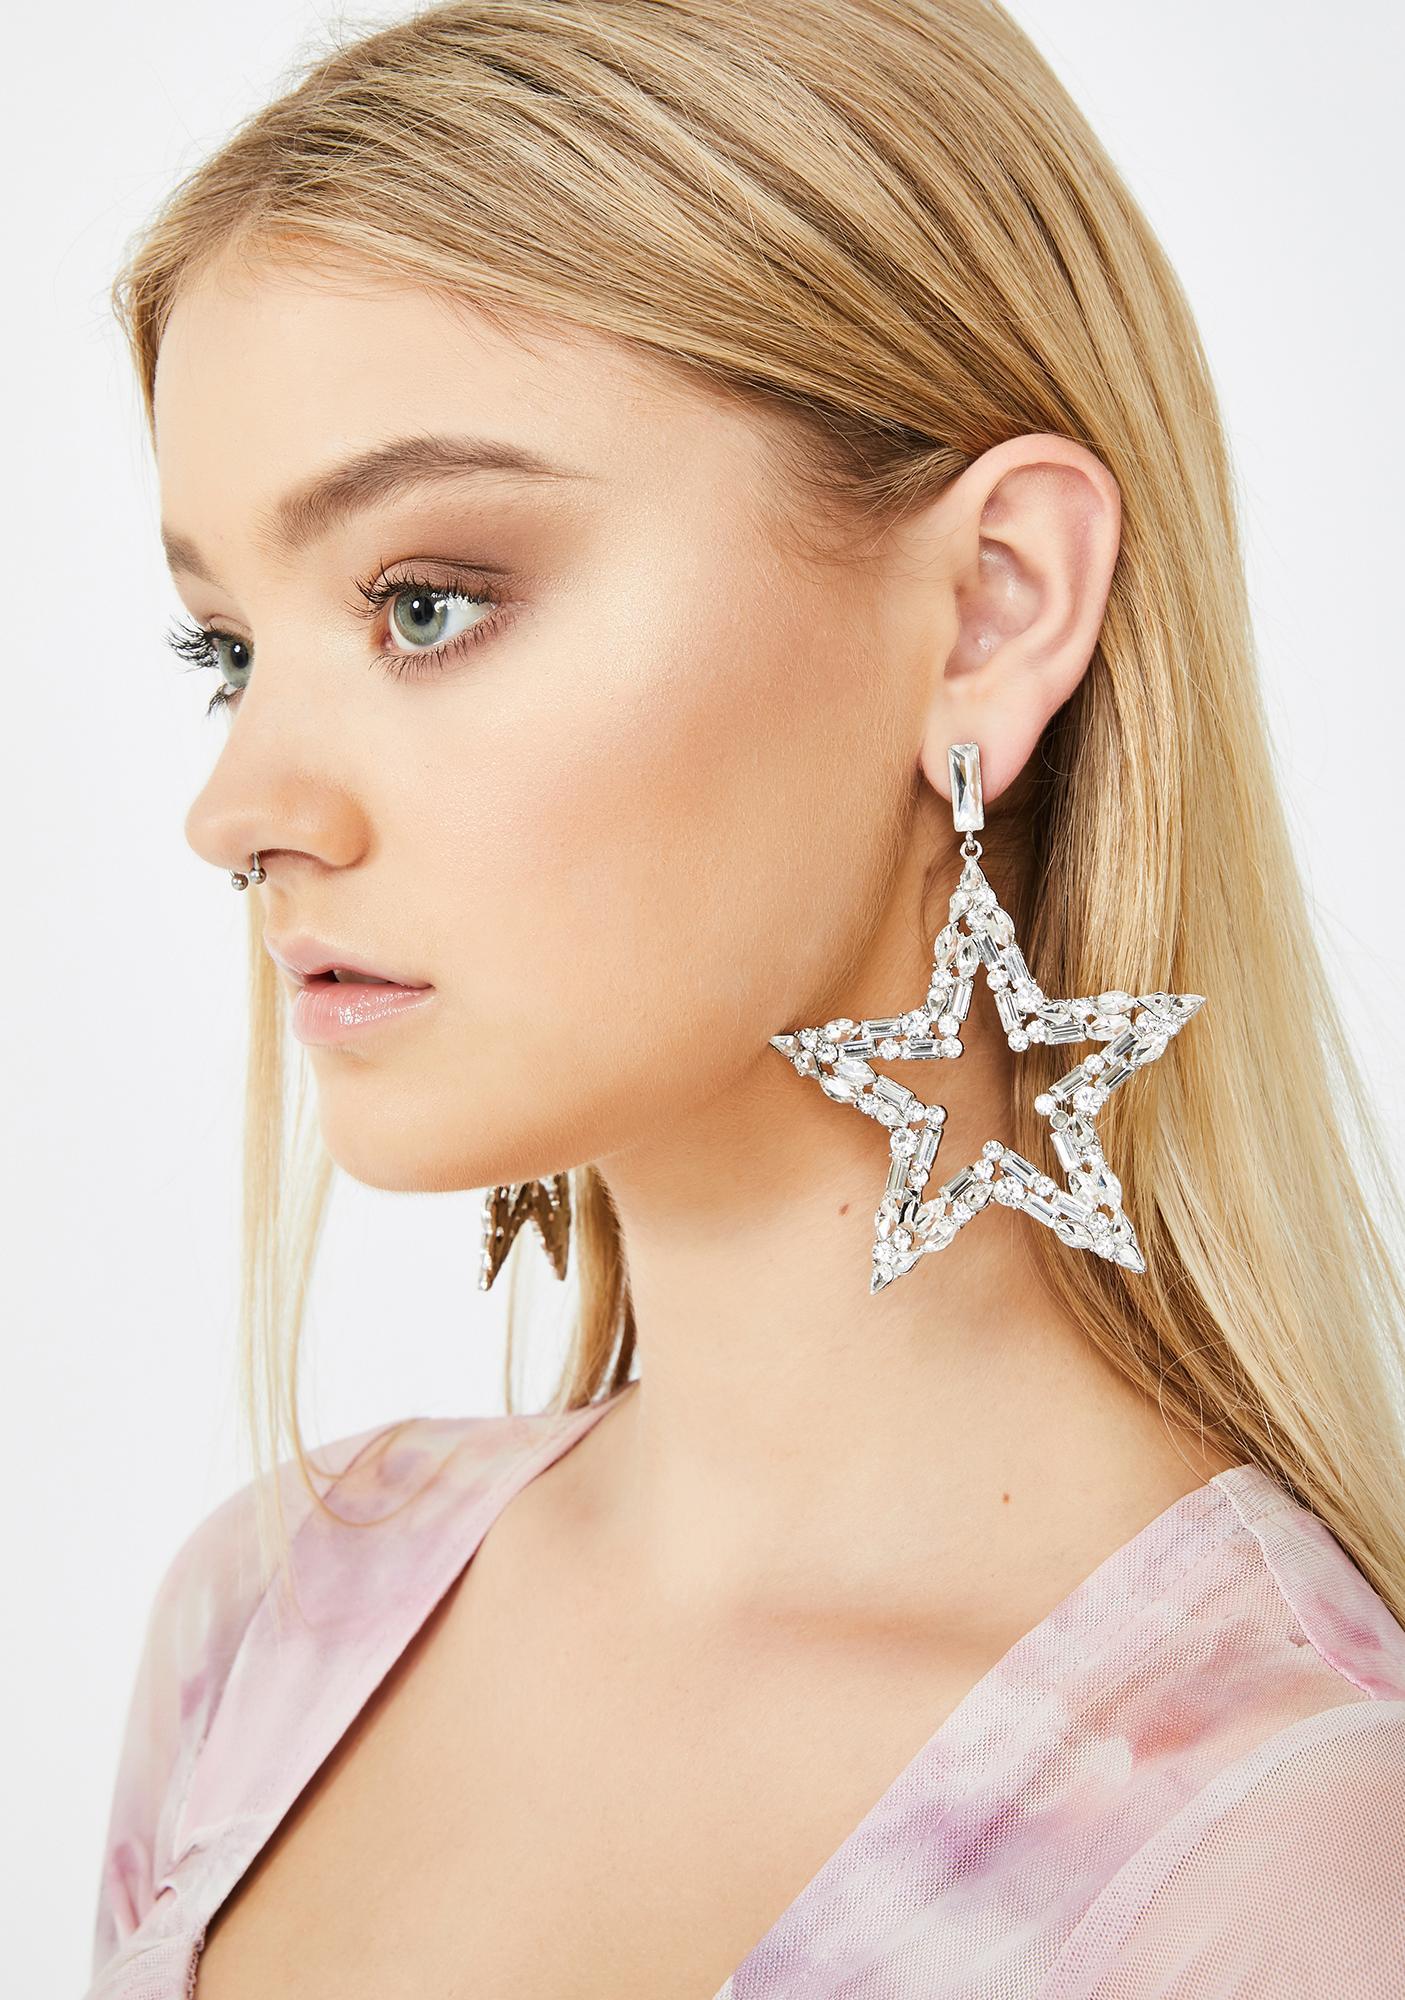 Starstruck Storm Rhinestone Earrings by